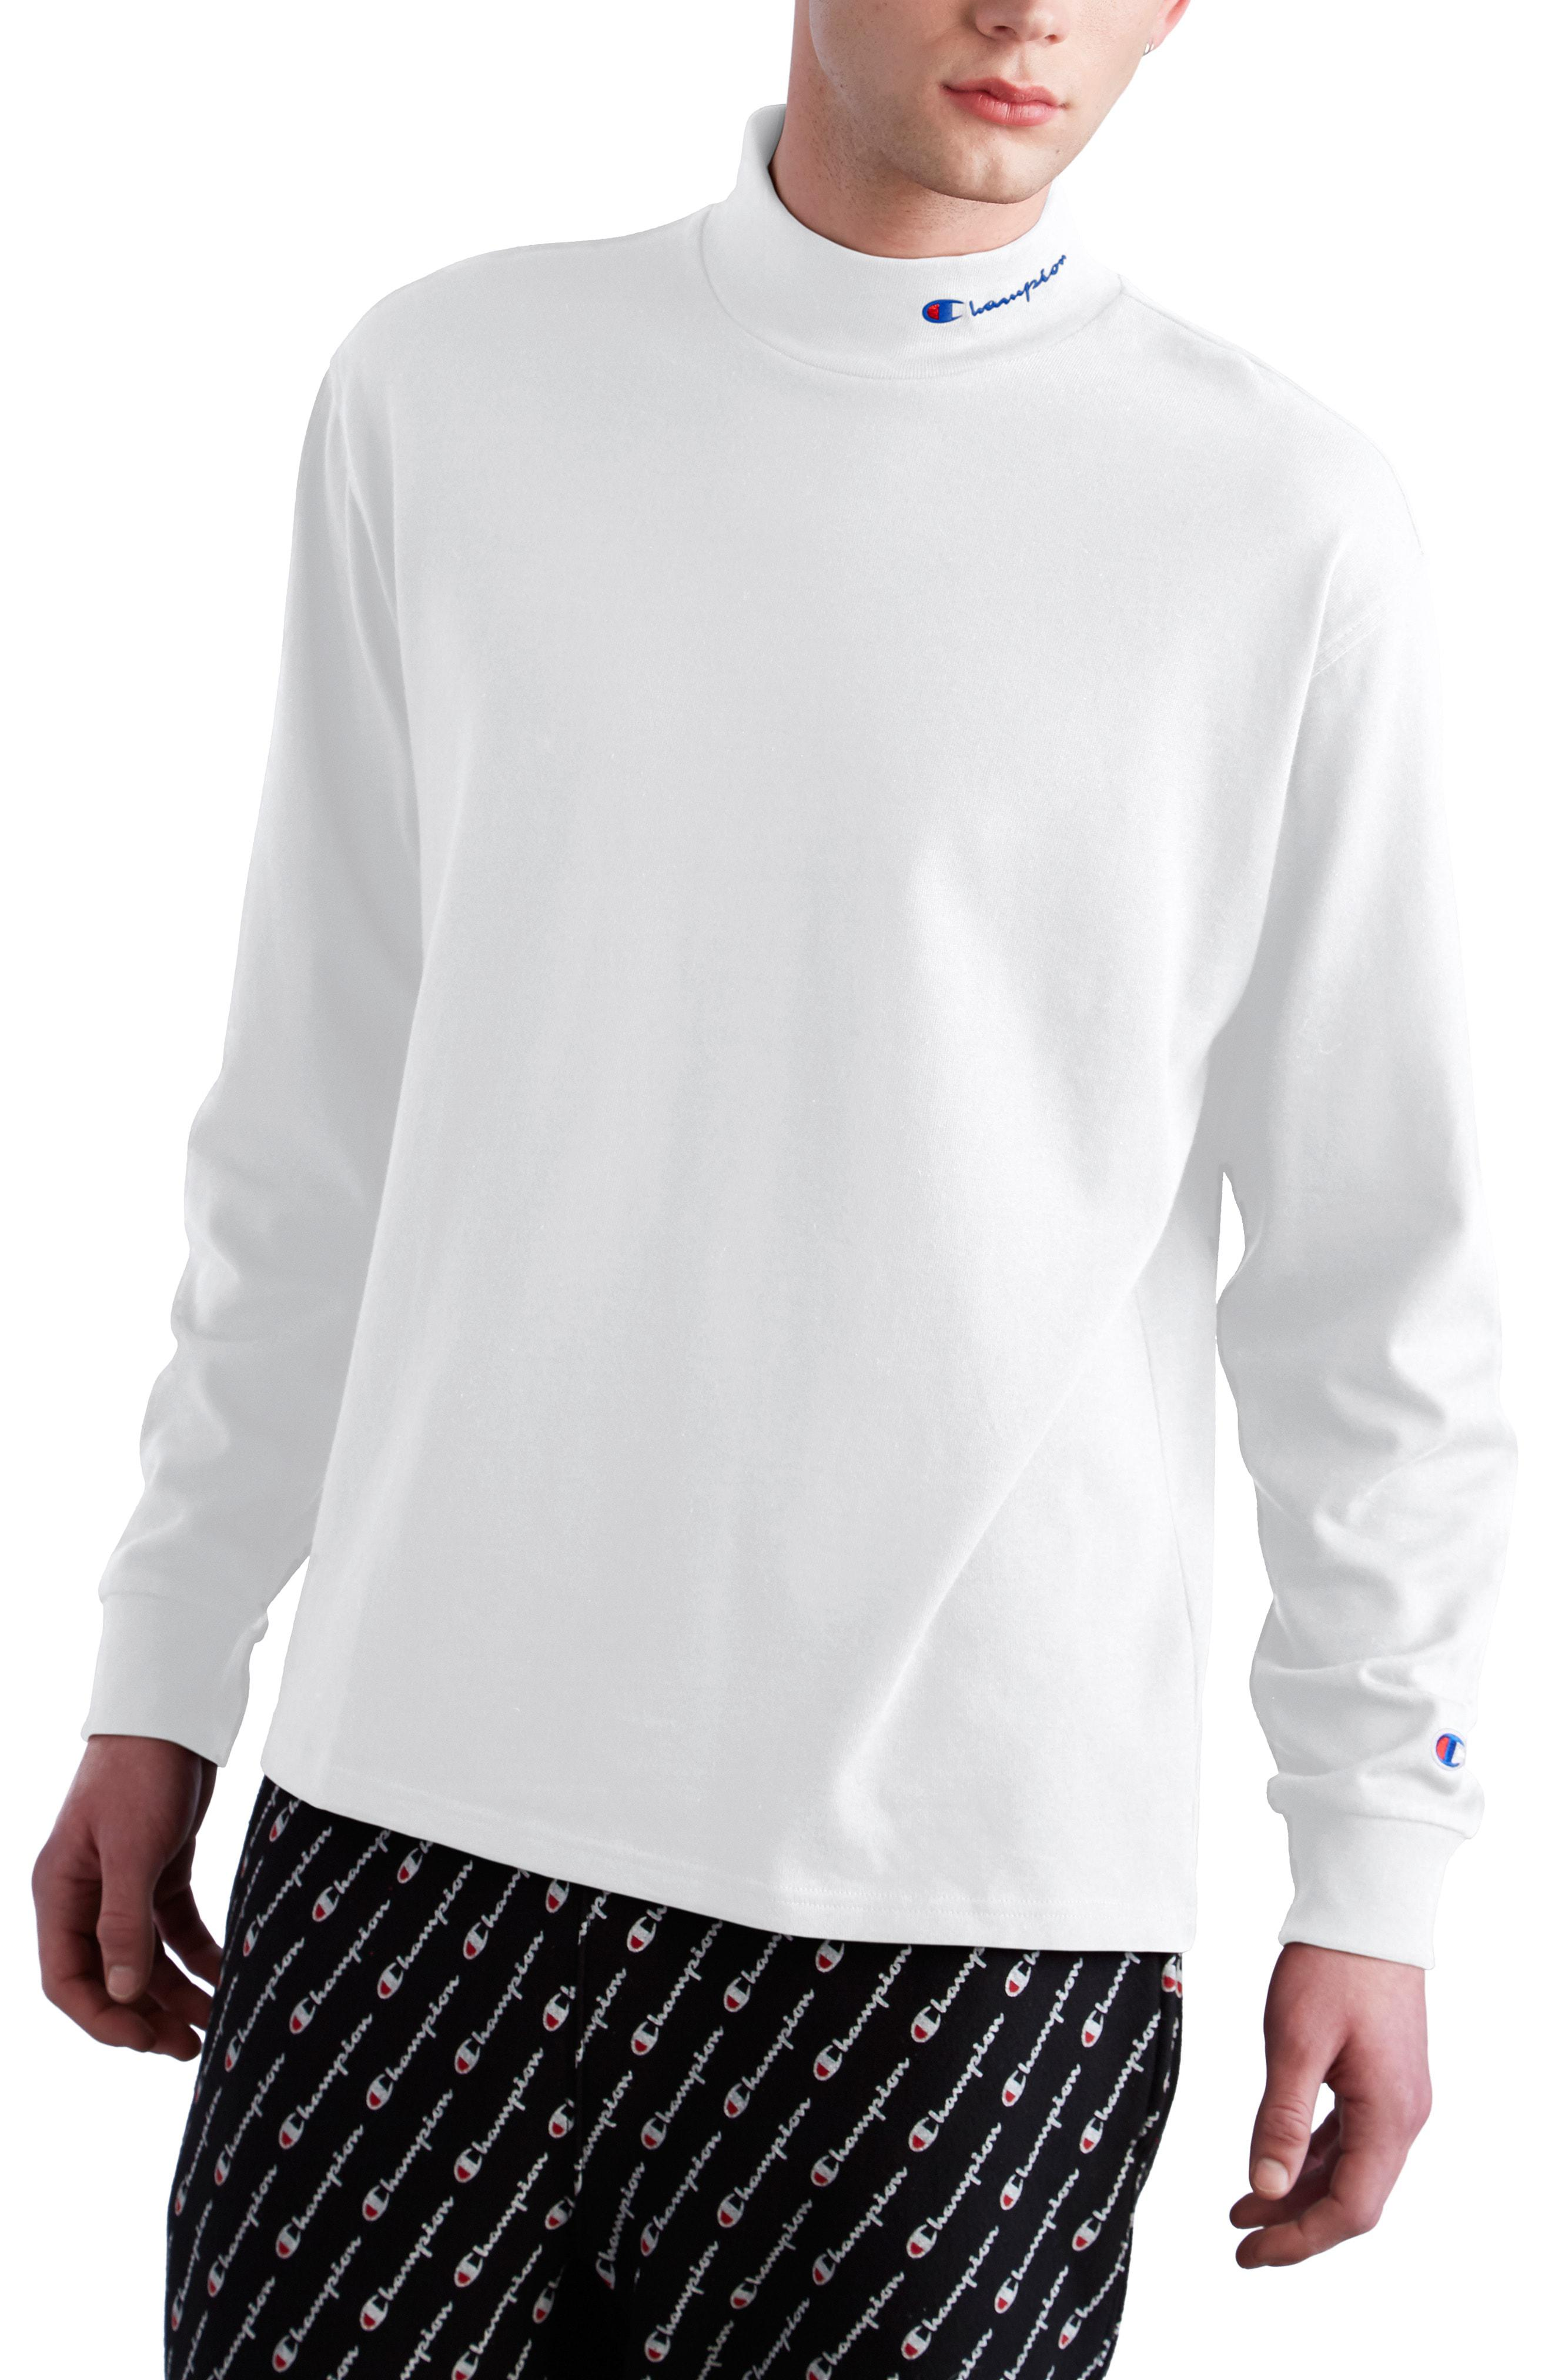 83ae767f2b2 Champion - White Heavyweight Mock Neck T-shirt for Men - Lyst. View  fullscreen